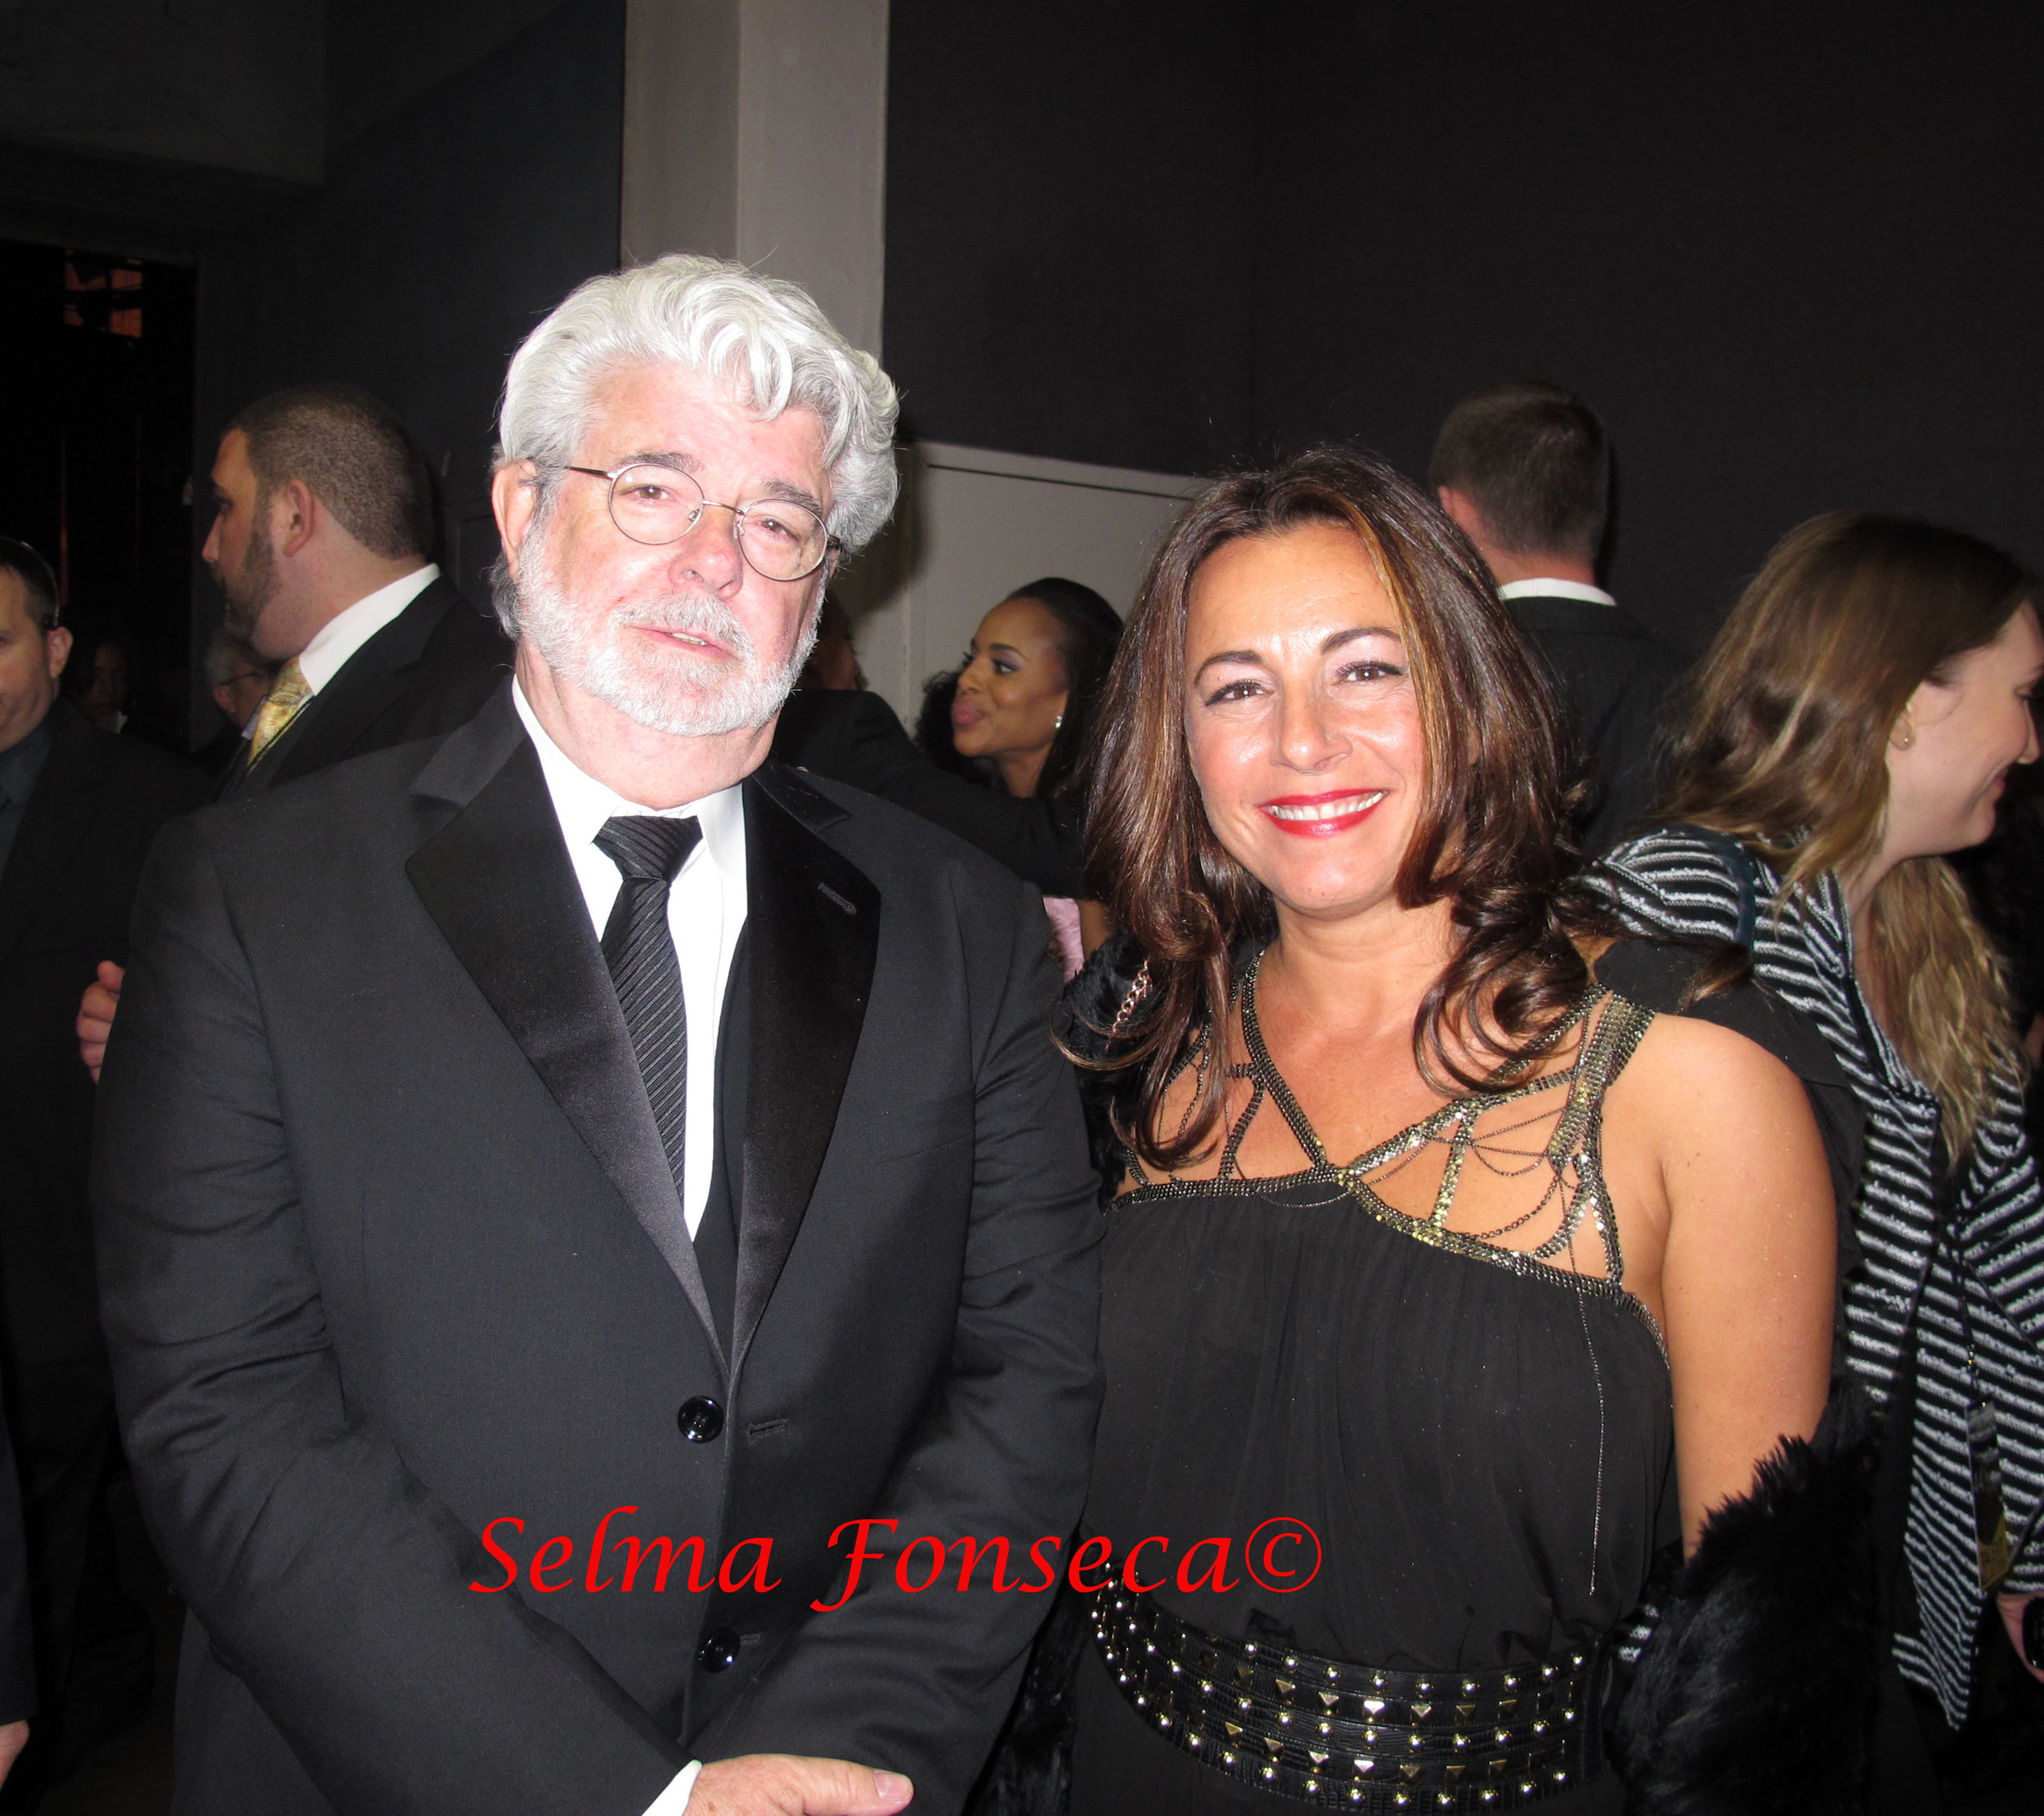 George Lucas_Selma Fonseca 2.jpg